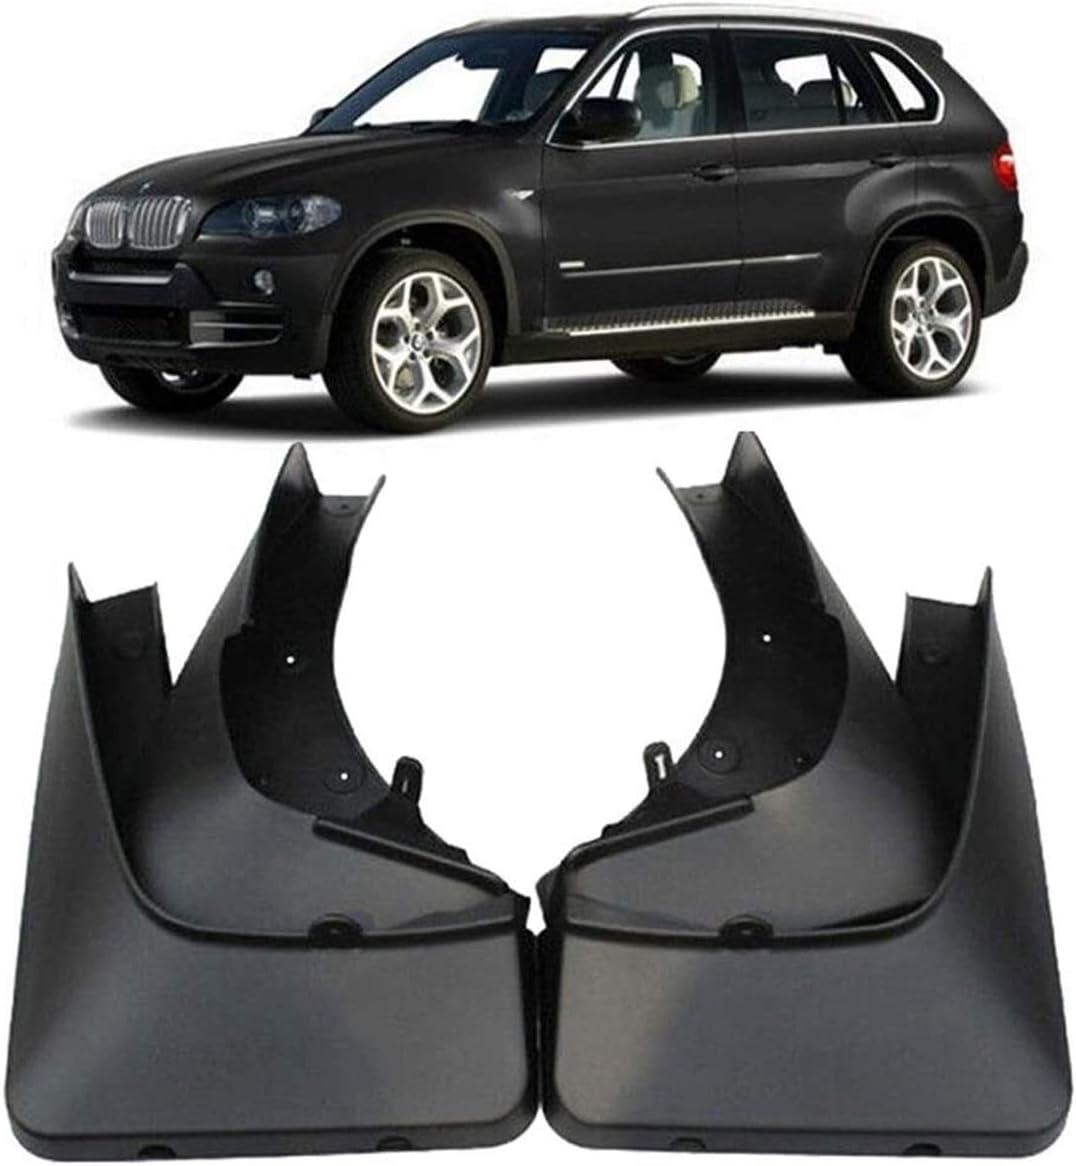 2007-2013 2008 2009 2010 2011 2012 Color : Black With Pedal XIHEJD Car Auto Mudflaps mudguard Splash GuardsMud Flaps Splash Guards Front and Rear Mud Guard Set Compatible with B-MW X5 E70